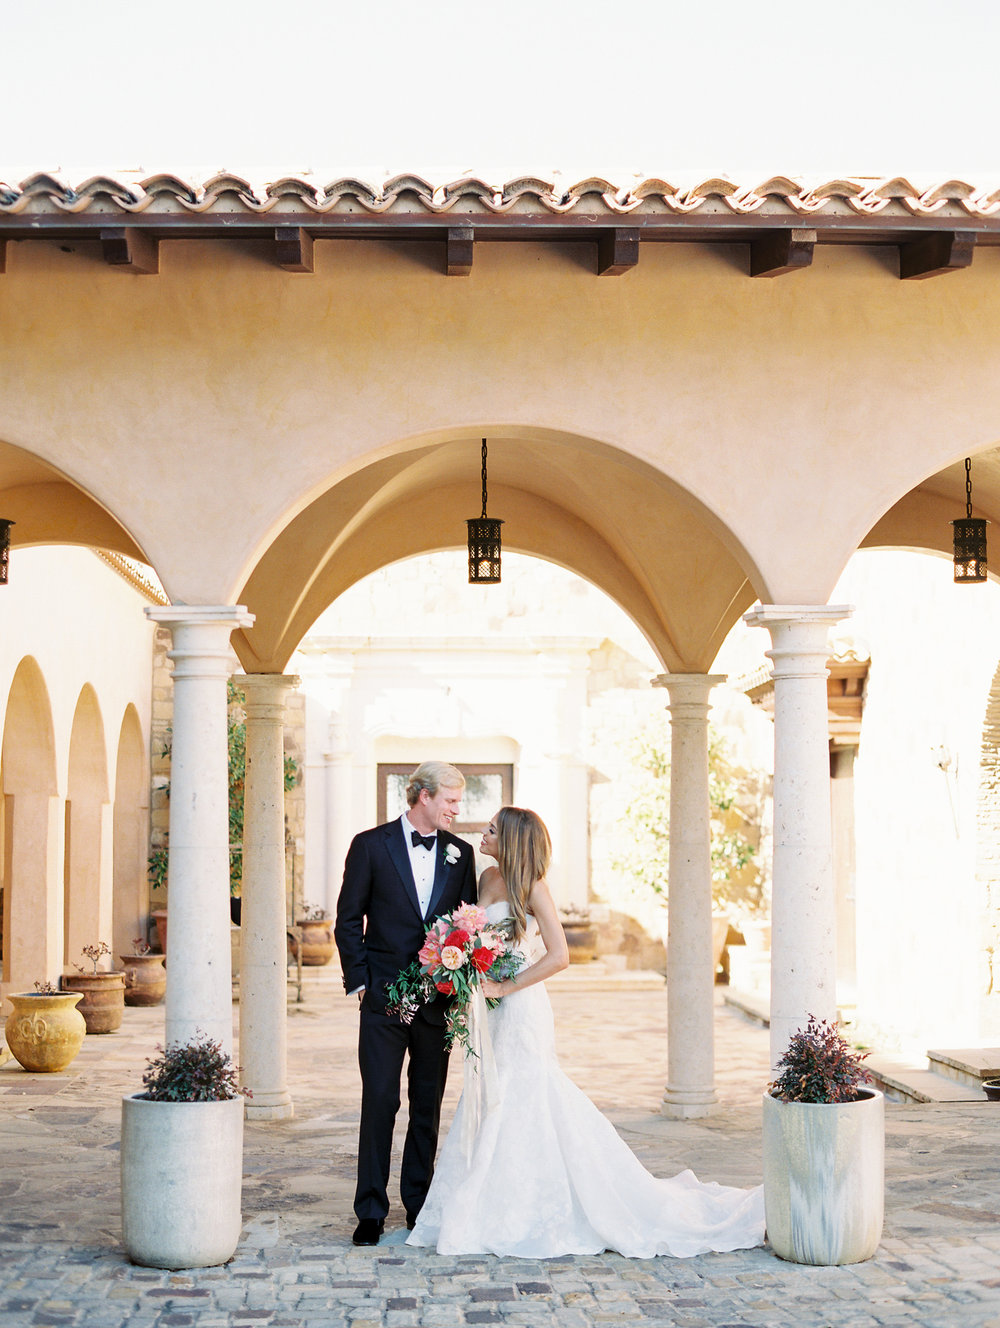 Escondido-Golf_Lake-Club-Hill-Country-Houston-Wedding-Photographer-Best-Top-Luxury-Destination-Engagements-Portrait-Austin-Photography-2.jpg